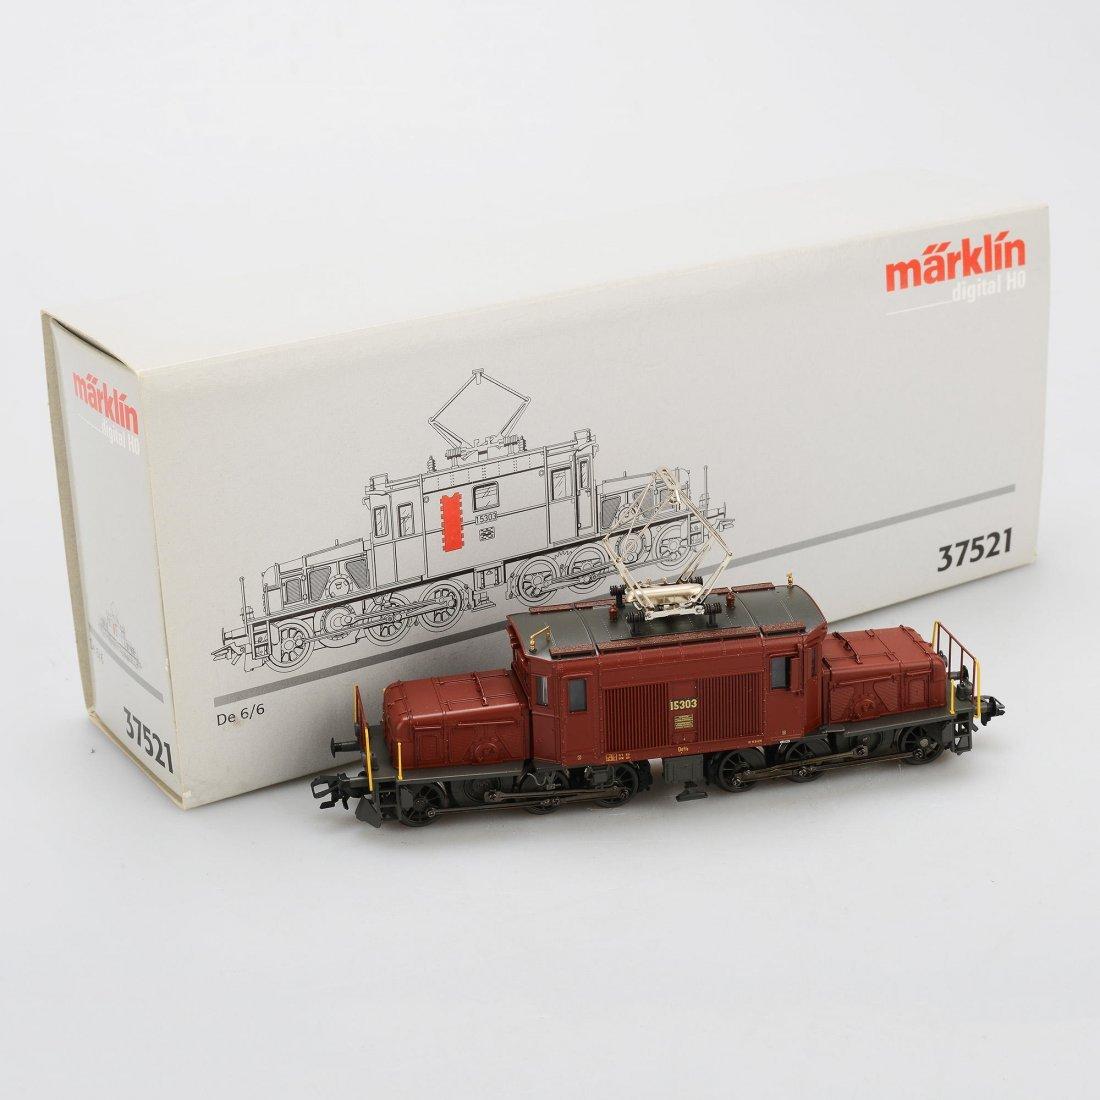 ELLOK, 37521, Marklin, Digital H0